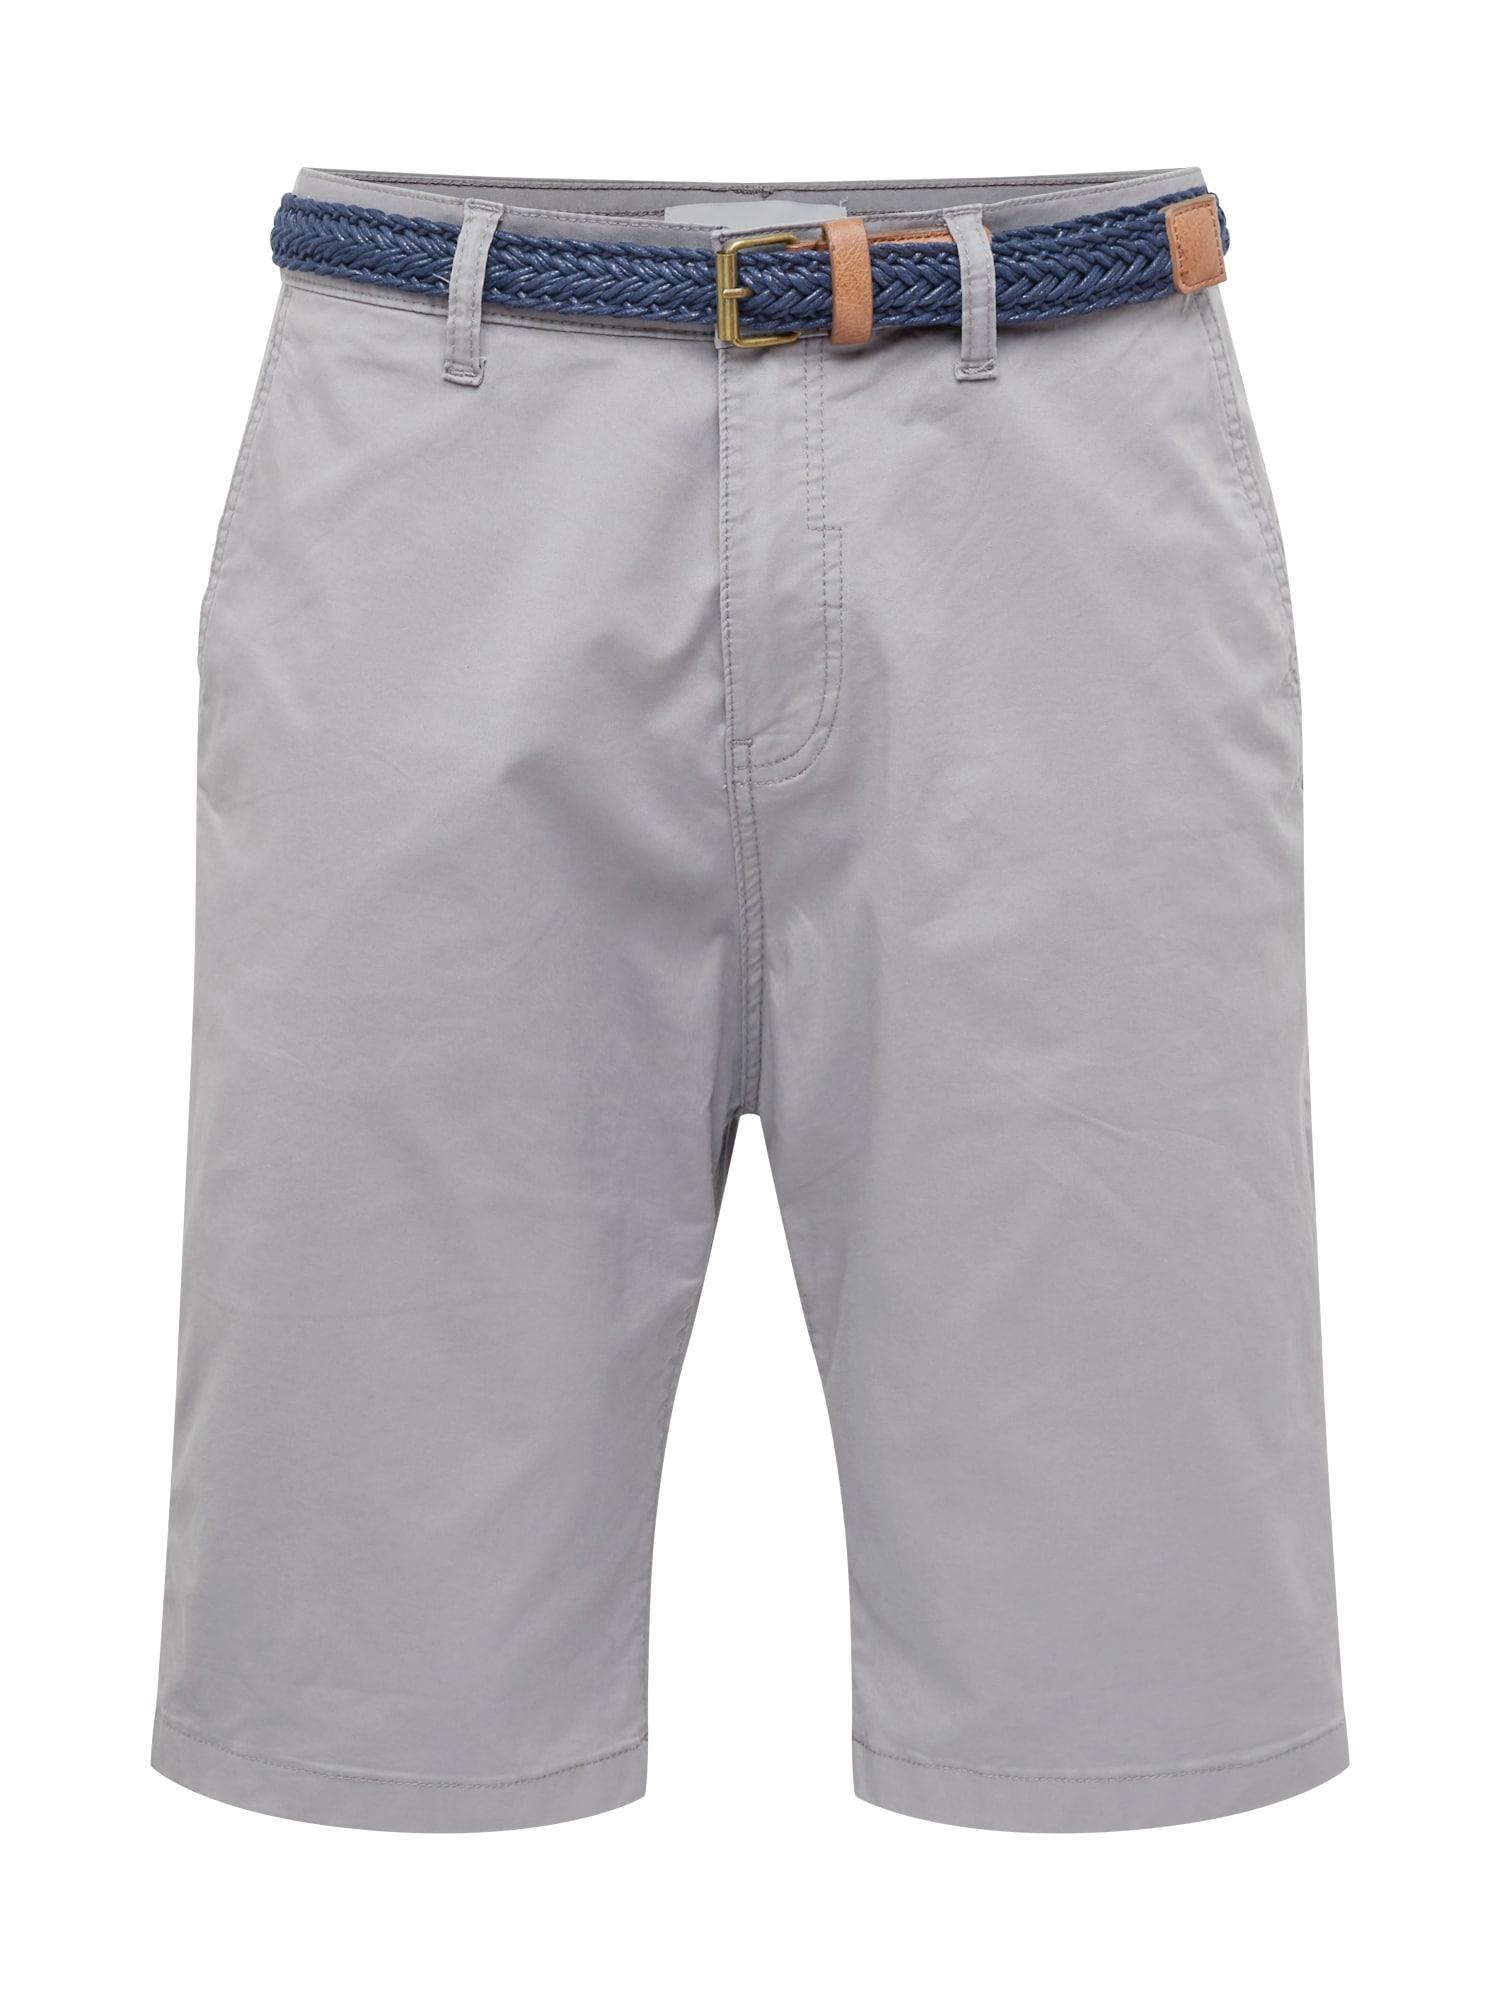 Chino kalhoty NOOS OCS světle šedá ESPRIT